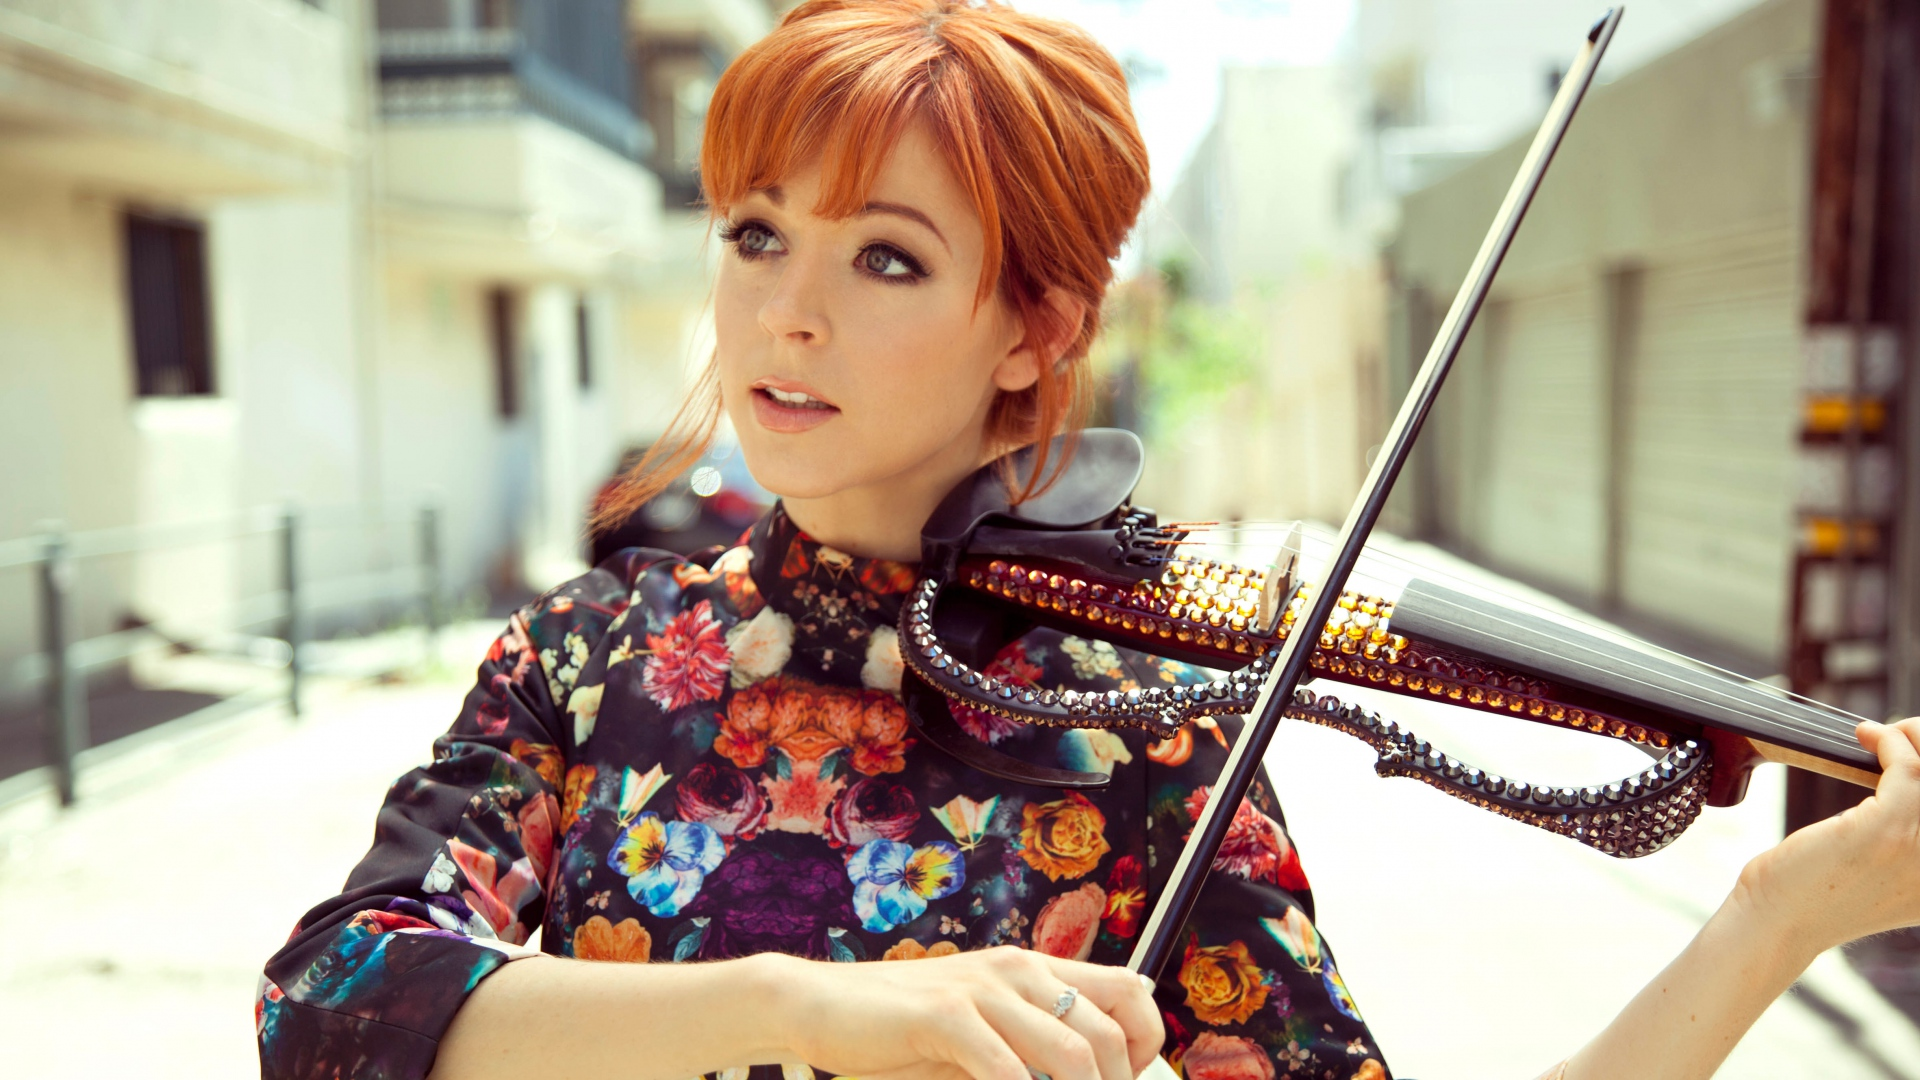 lindsey_stirling_violin_girl_musician_100465_1920x1080